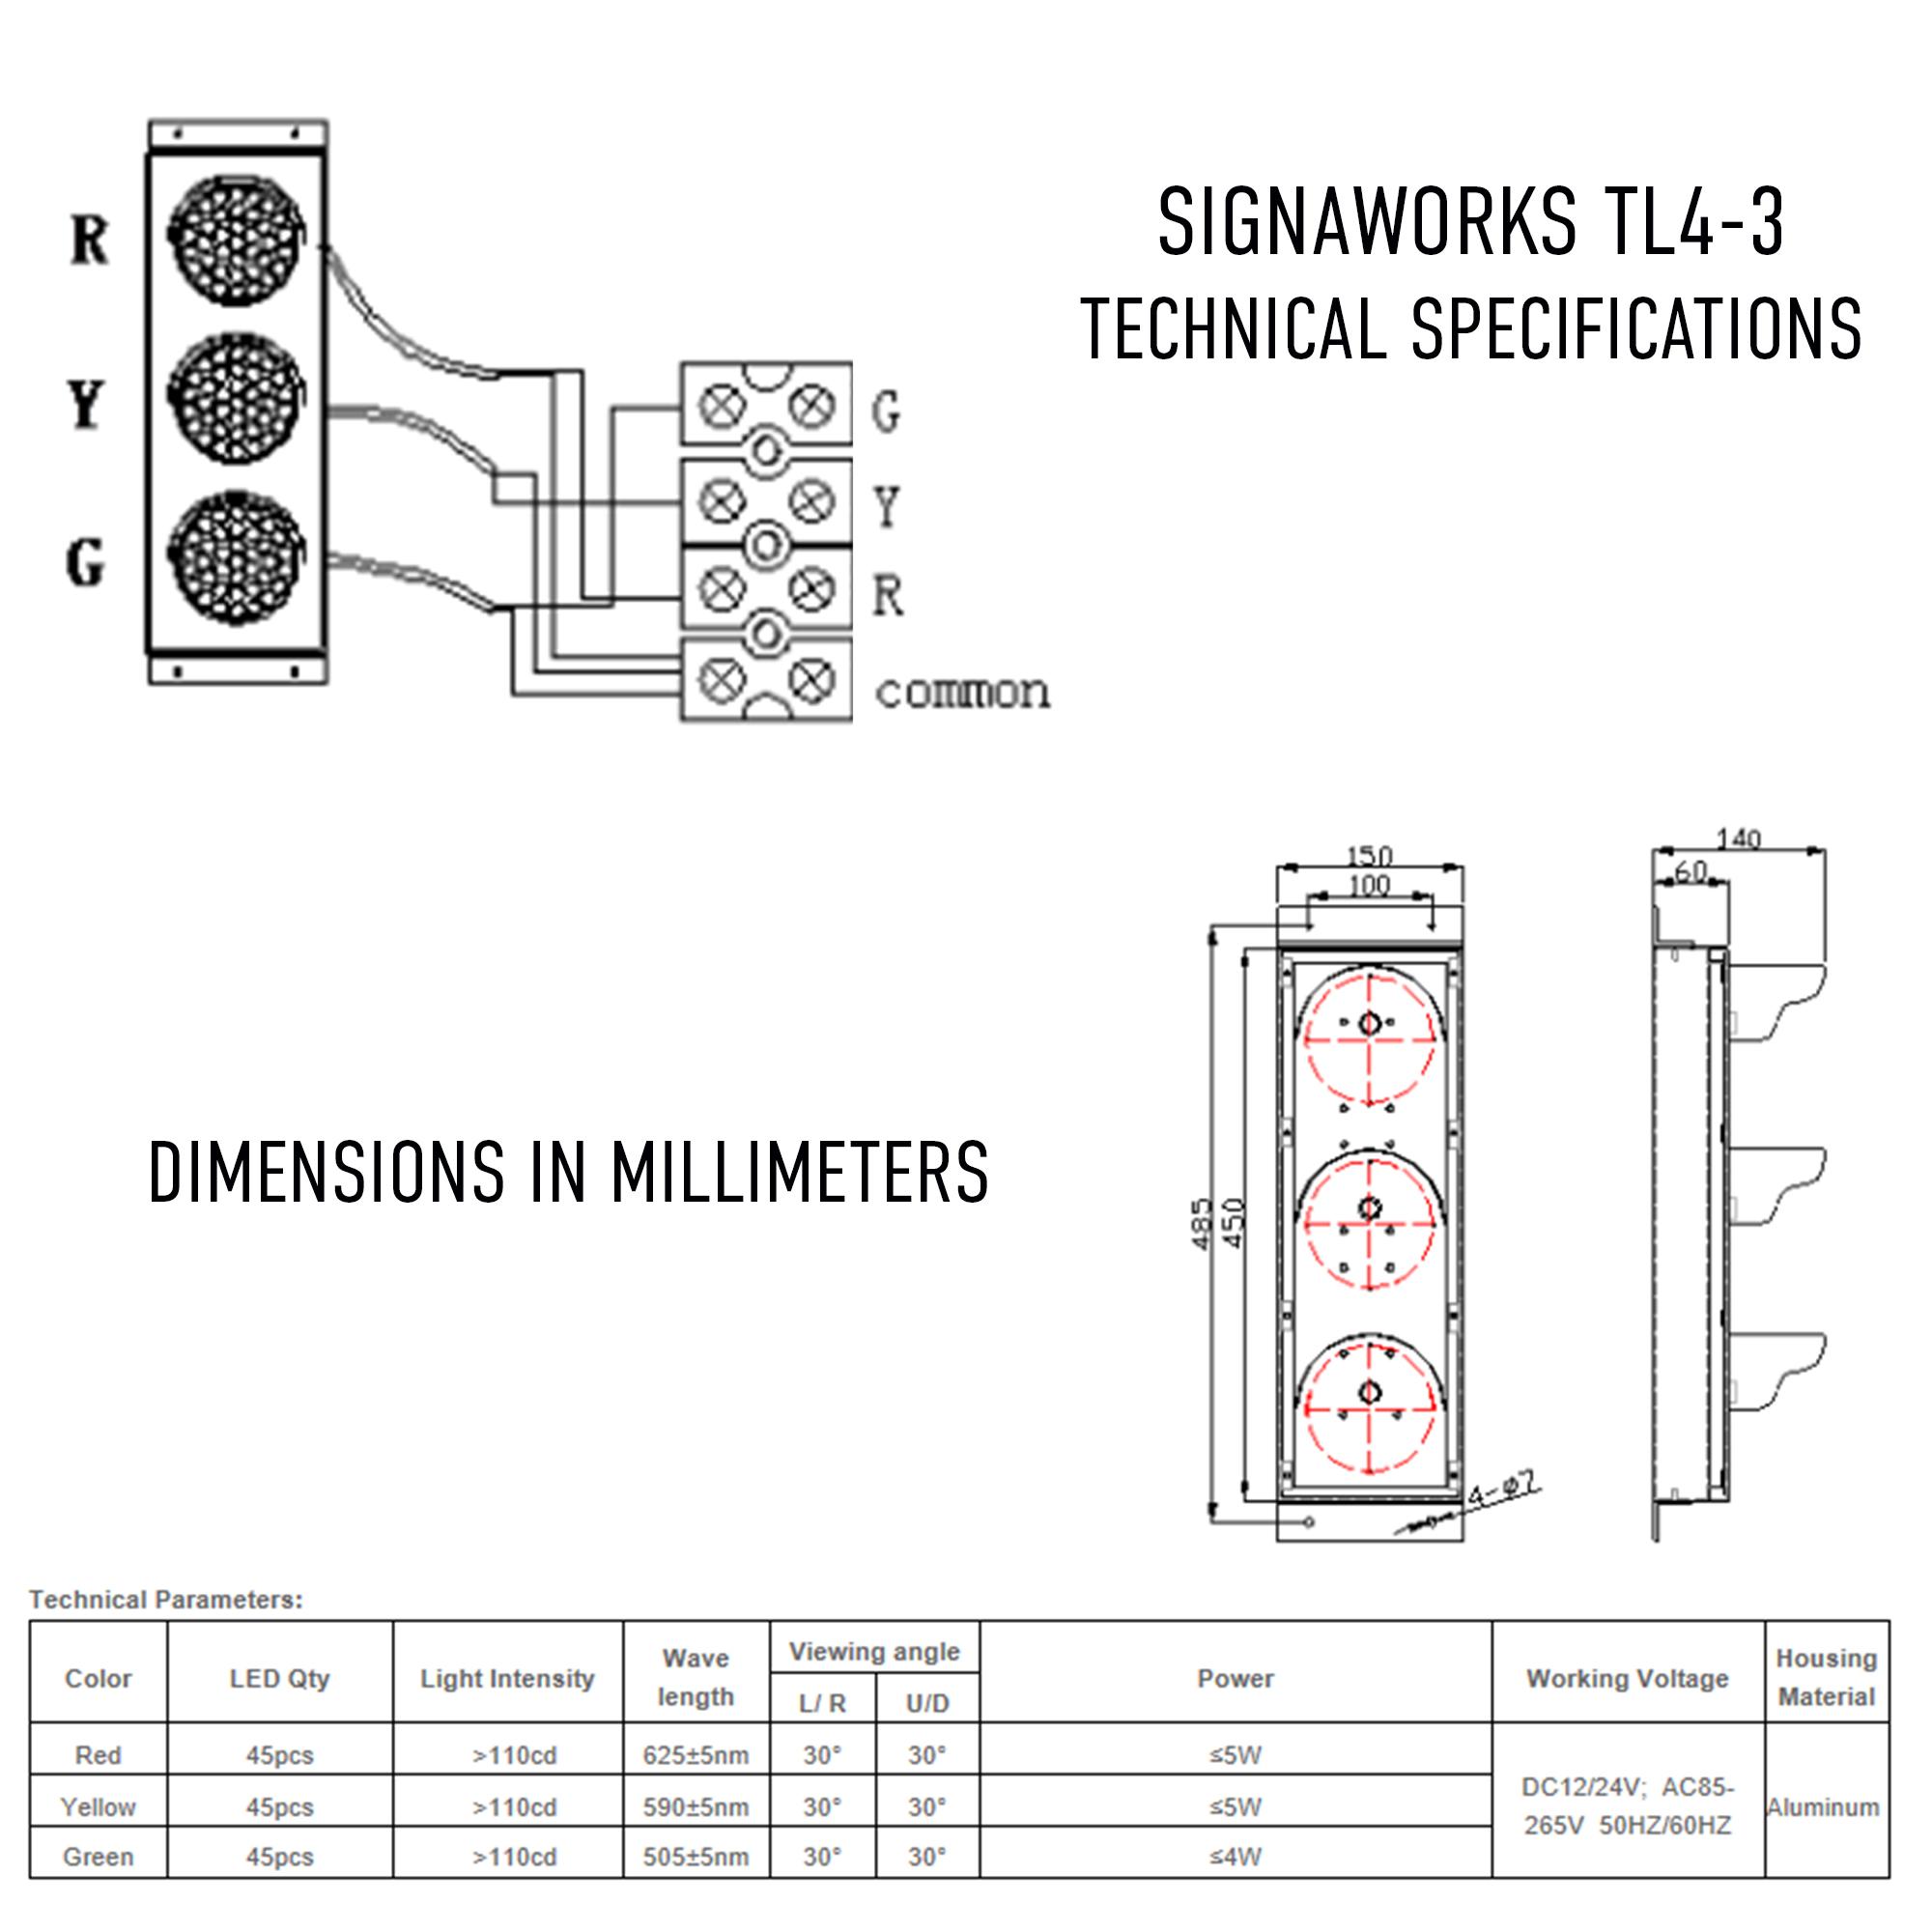 4 Inch Led Traffic Light Industrial Signaworks Trafficsignallightcontroldiagram3 Tl4 2 Pdf